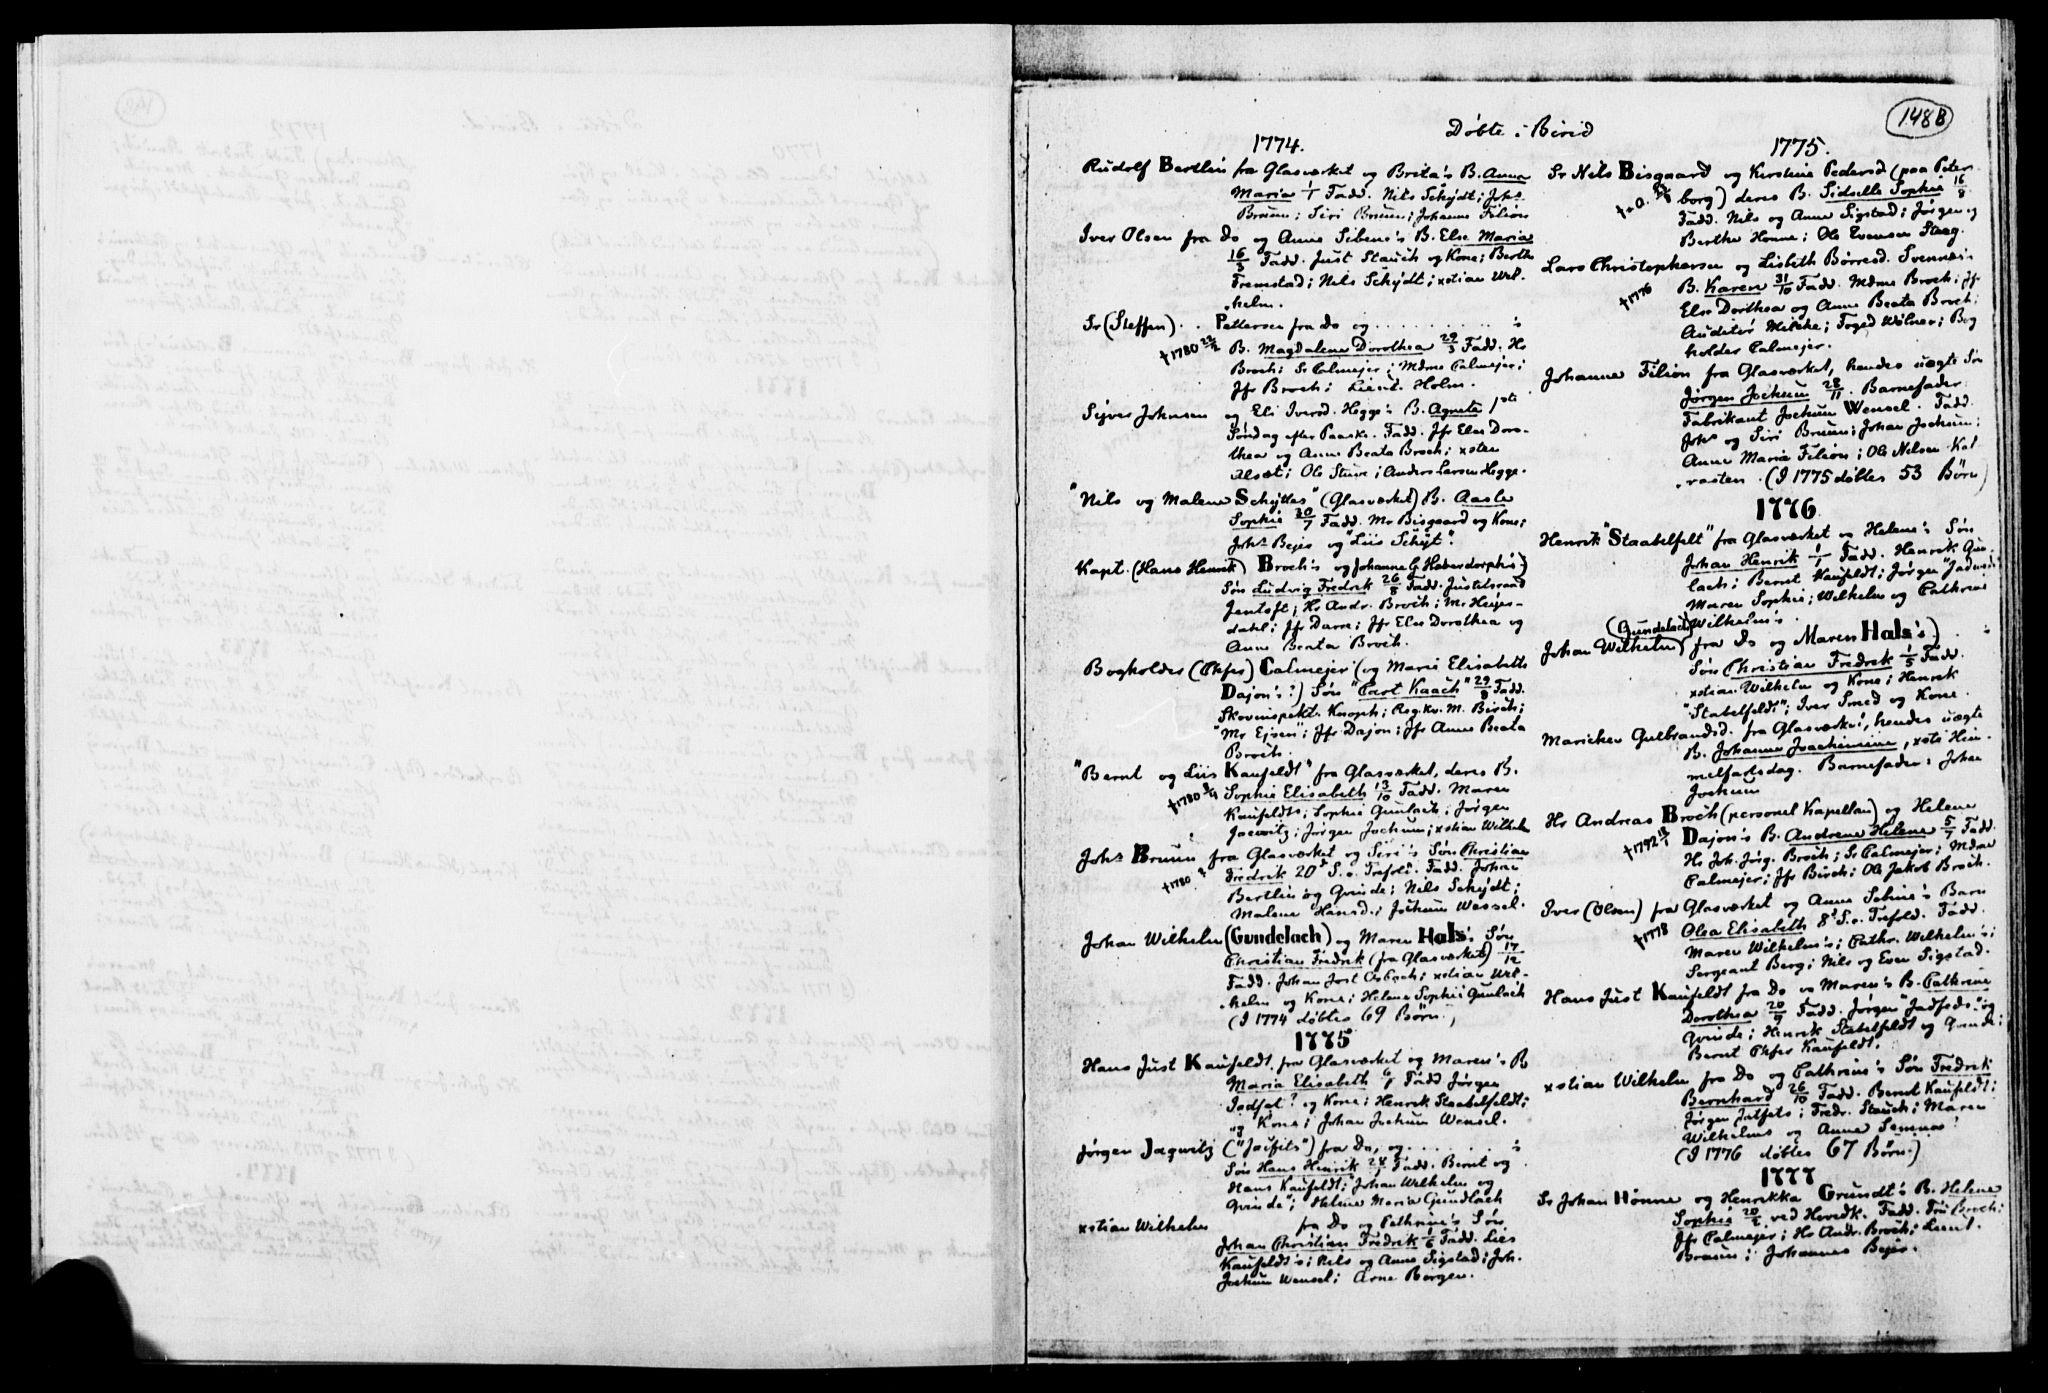 SAH, Biri prestekontor, Ministerialbok, 1730-1879, s. 148b